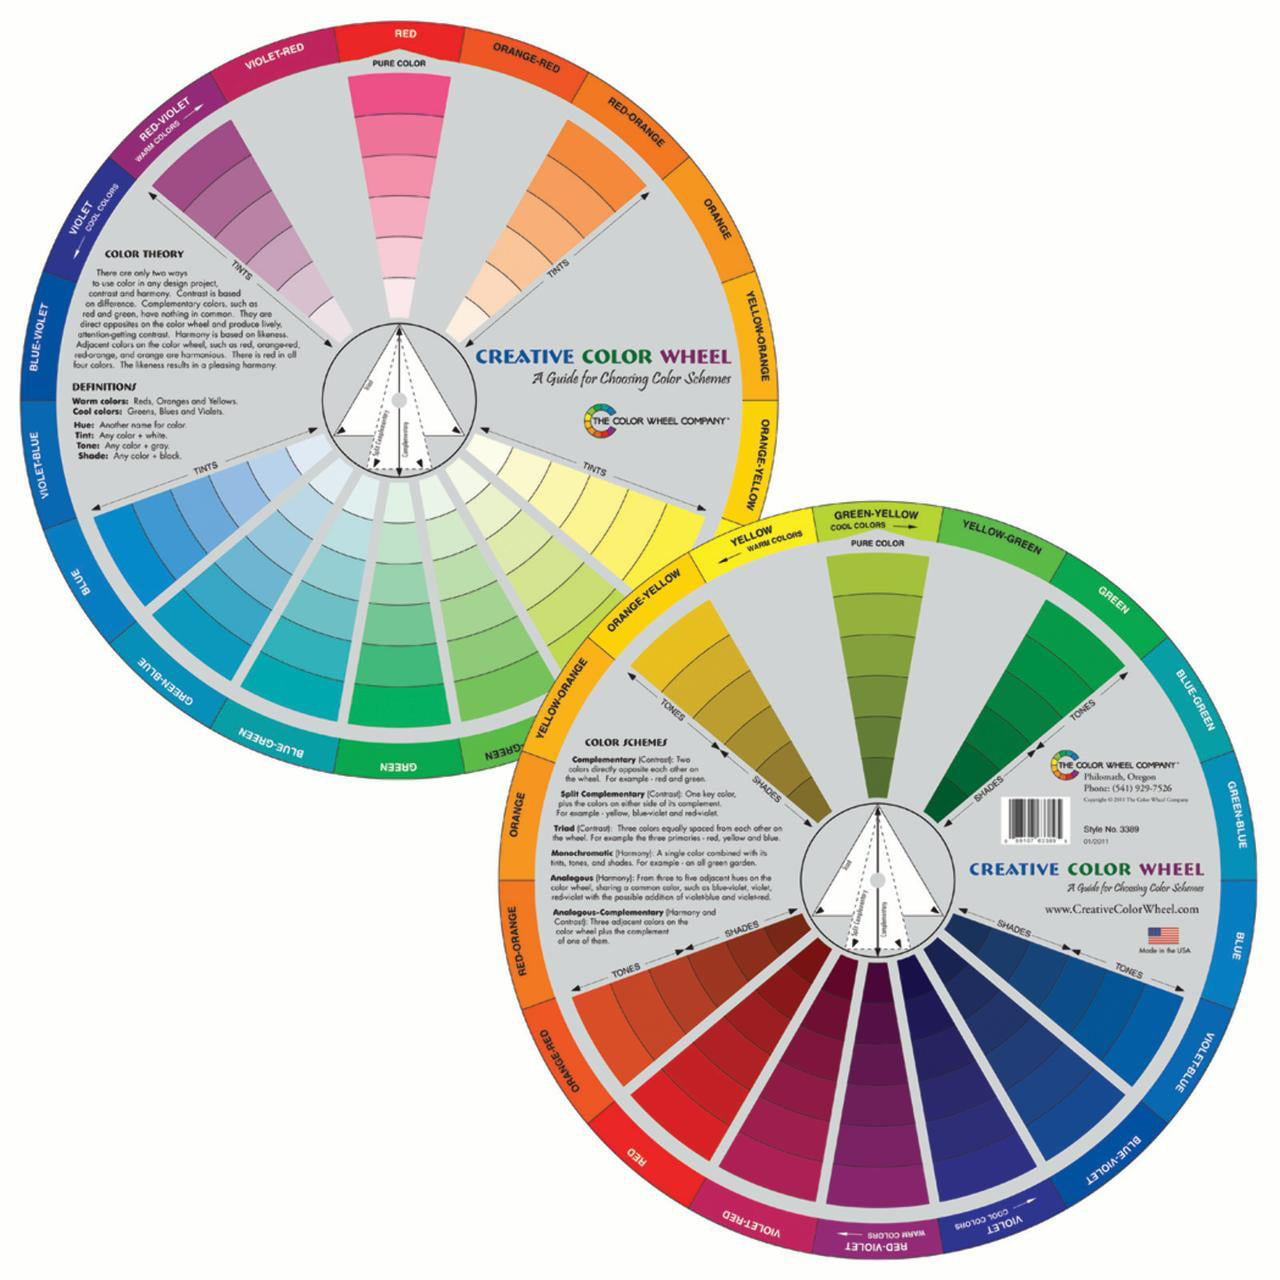 color wheel co creative color wheel 9 1 4 diameter. Black Bedroom Furniture Sets. Home Design Ideas